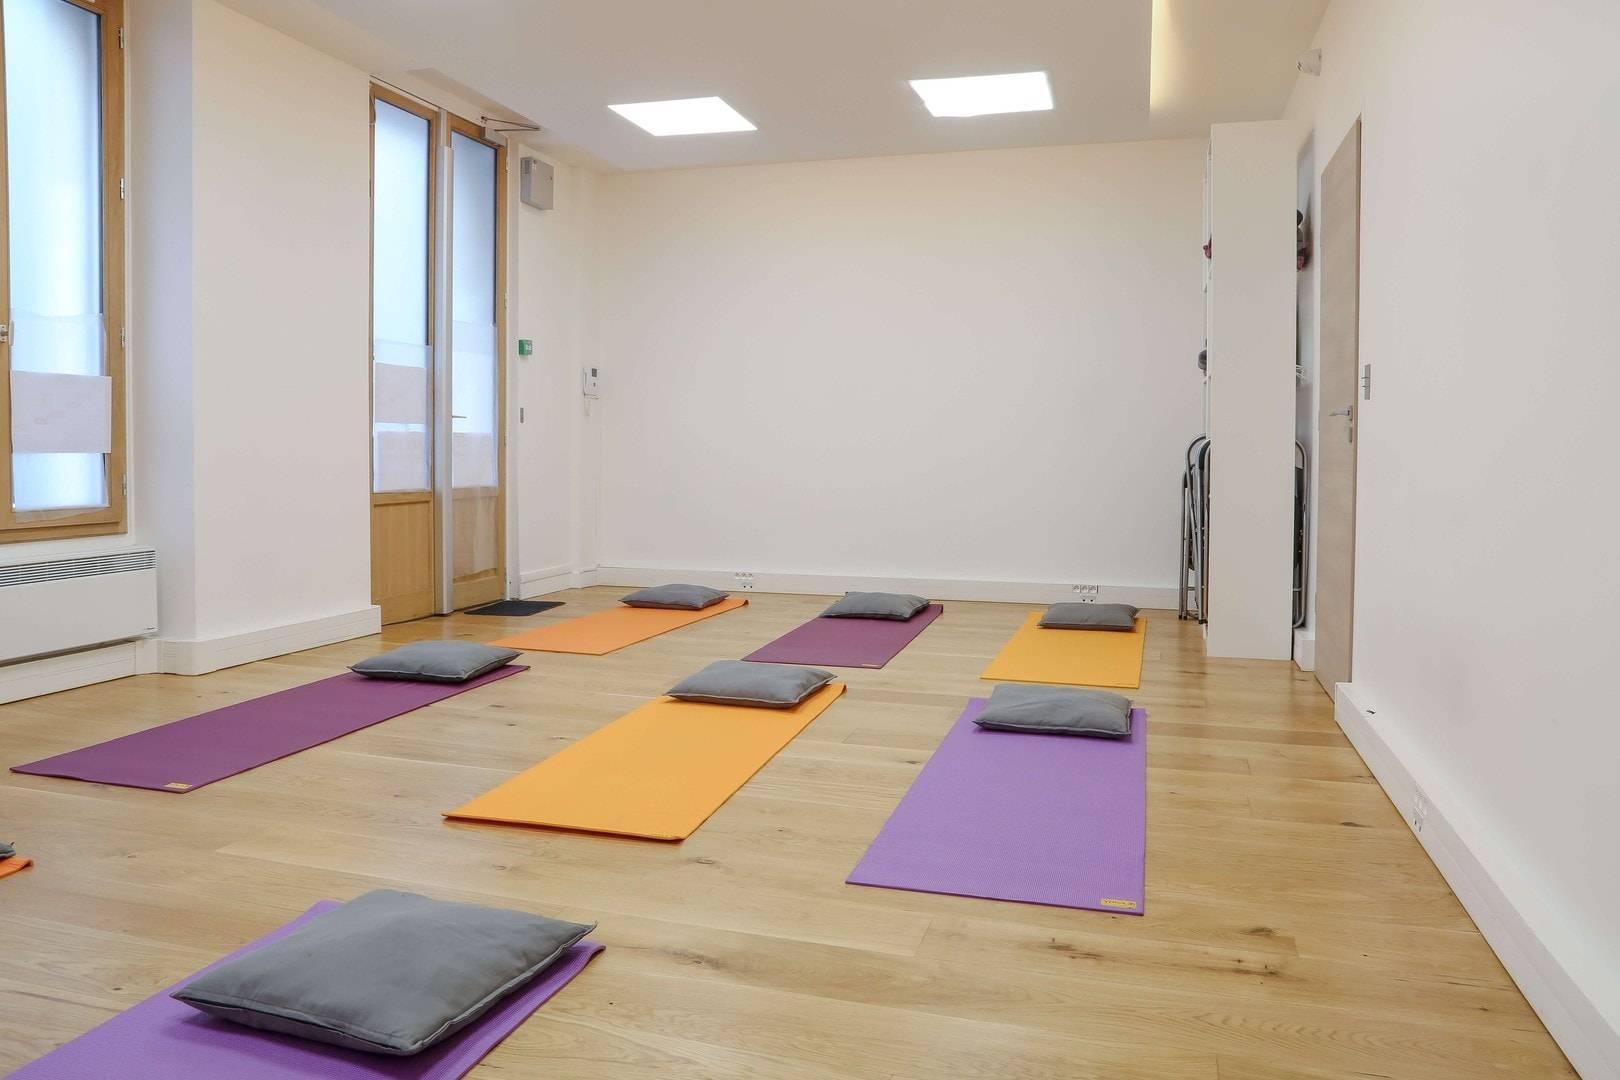 salle de yoga lumineuse rue du th tre paris 15 me salle 10. Black Bedroom Furniture Sets. Home Design Ideas